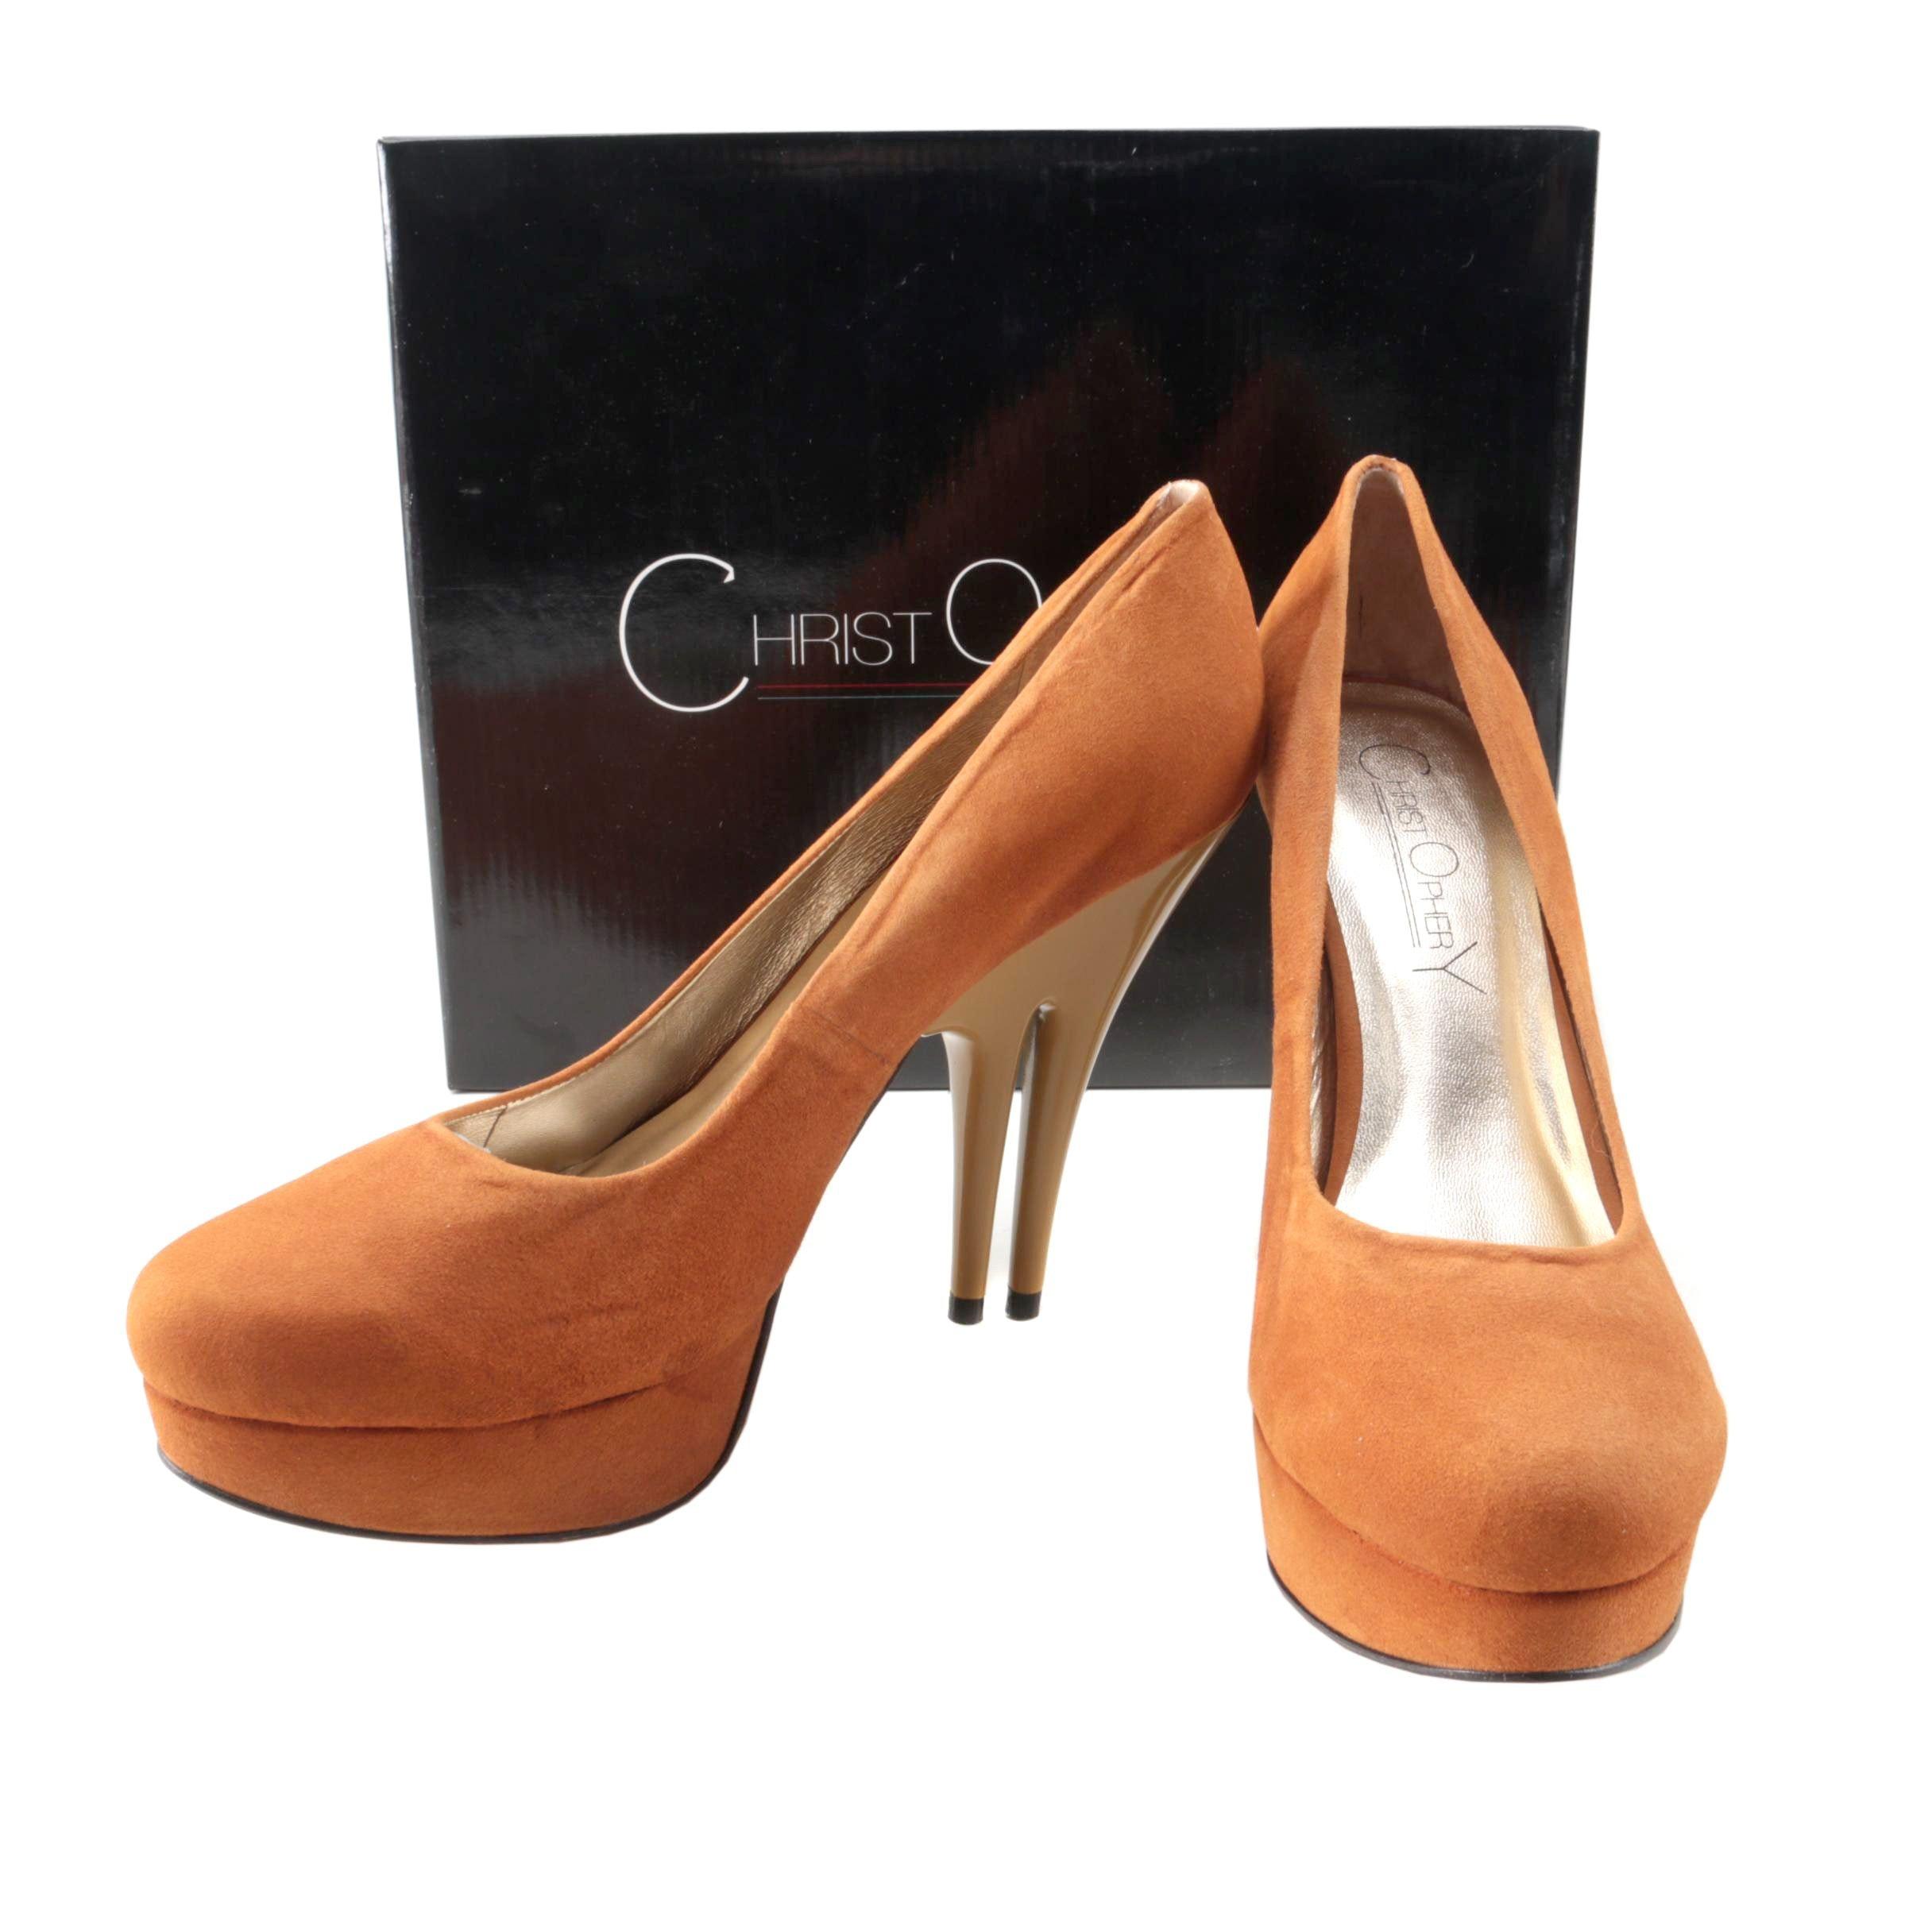 Christopher Coy Collection Prototype Heels in Tan Suede